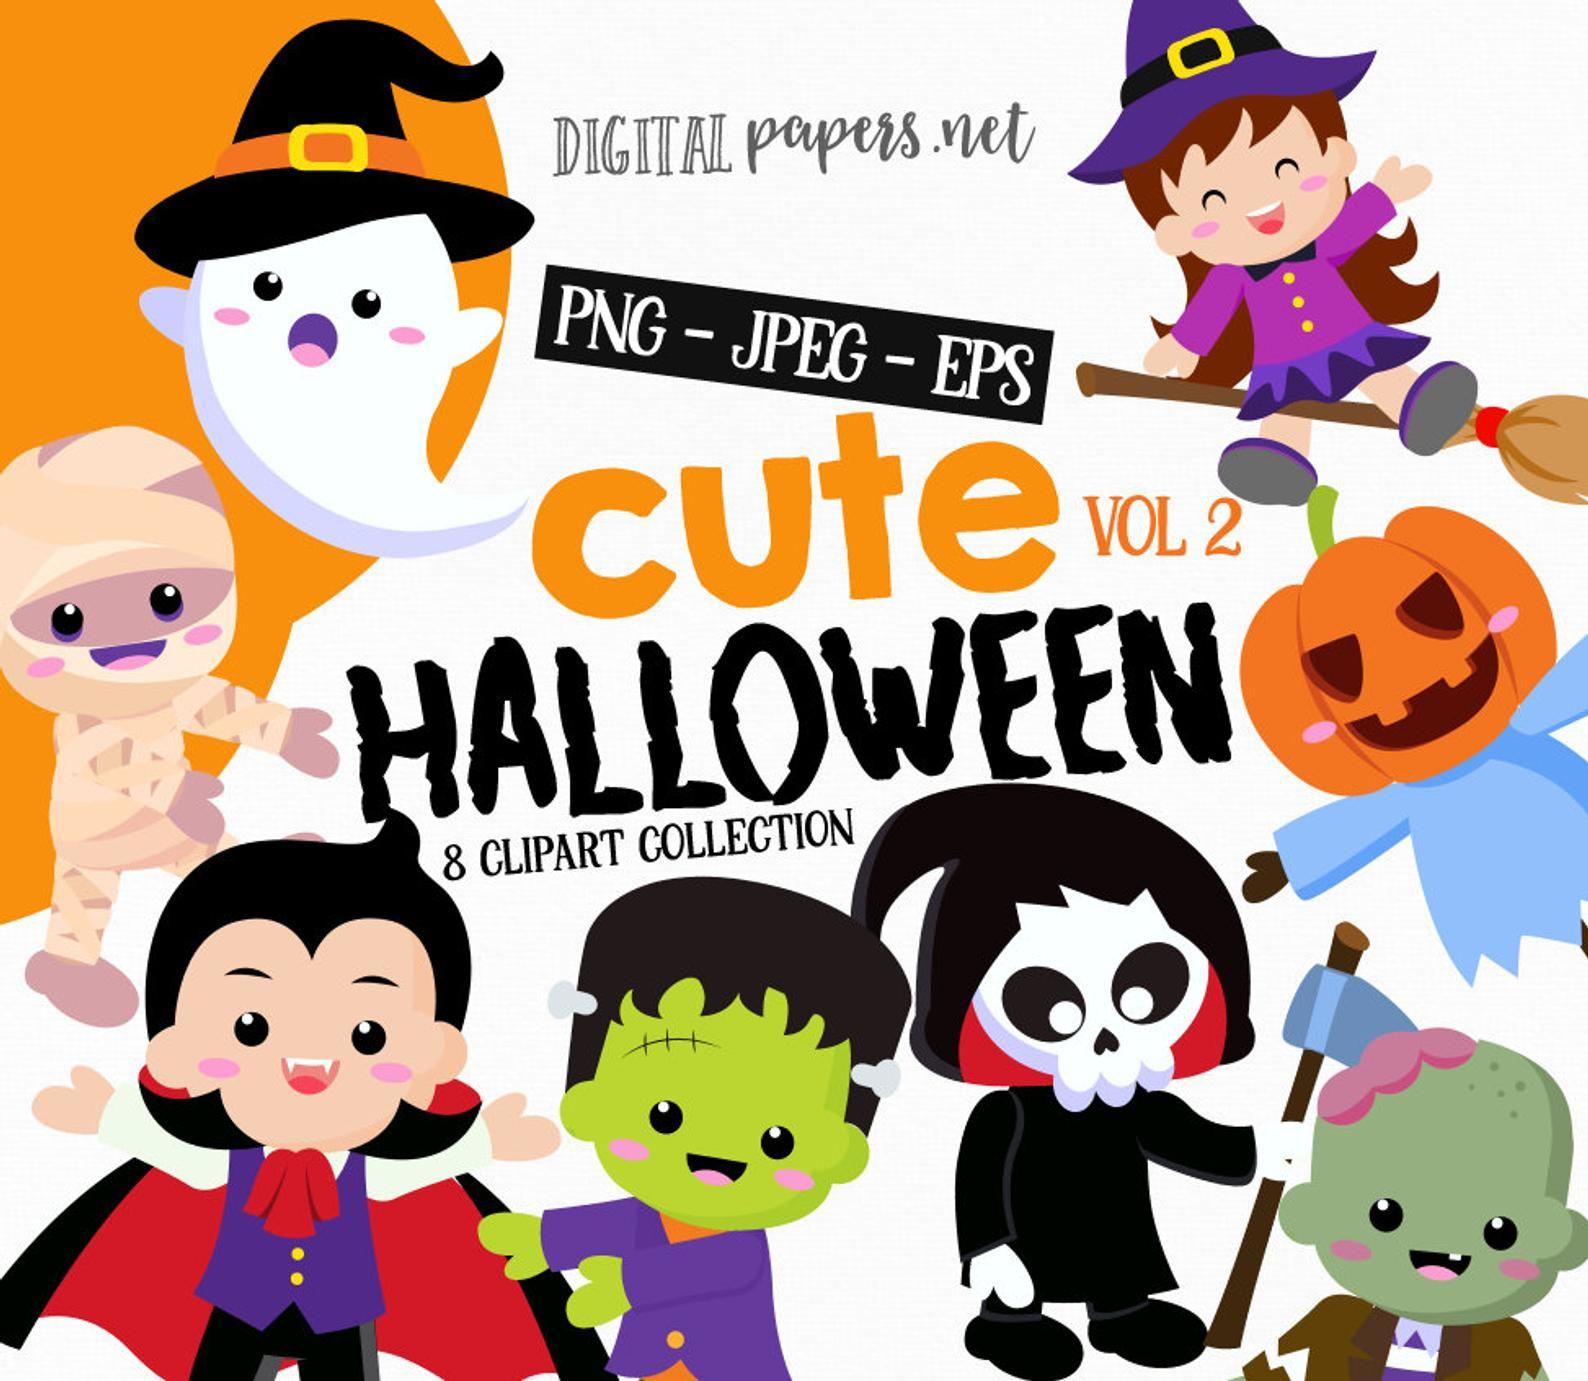 Halloween Cute Clipart Halloween Birthday Party Png Clipart Etsy Birthday Halloween Party Halloween Birthday Cute Clipart